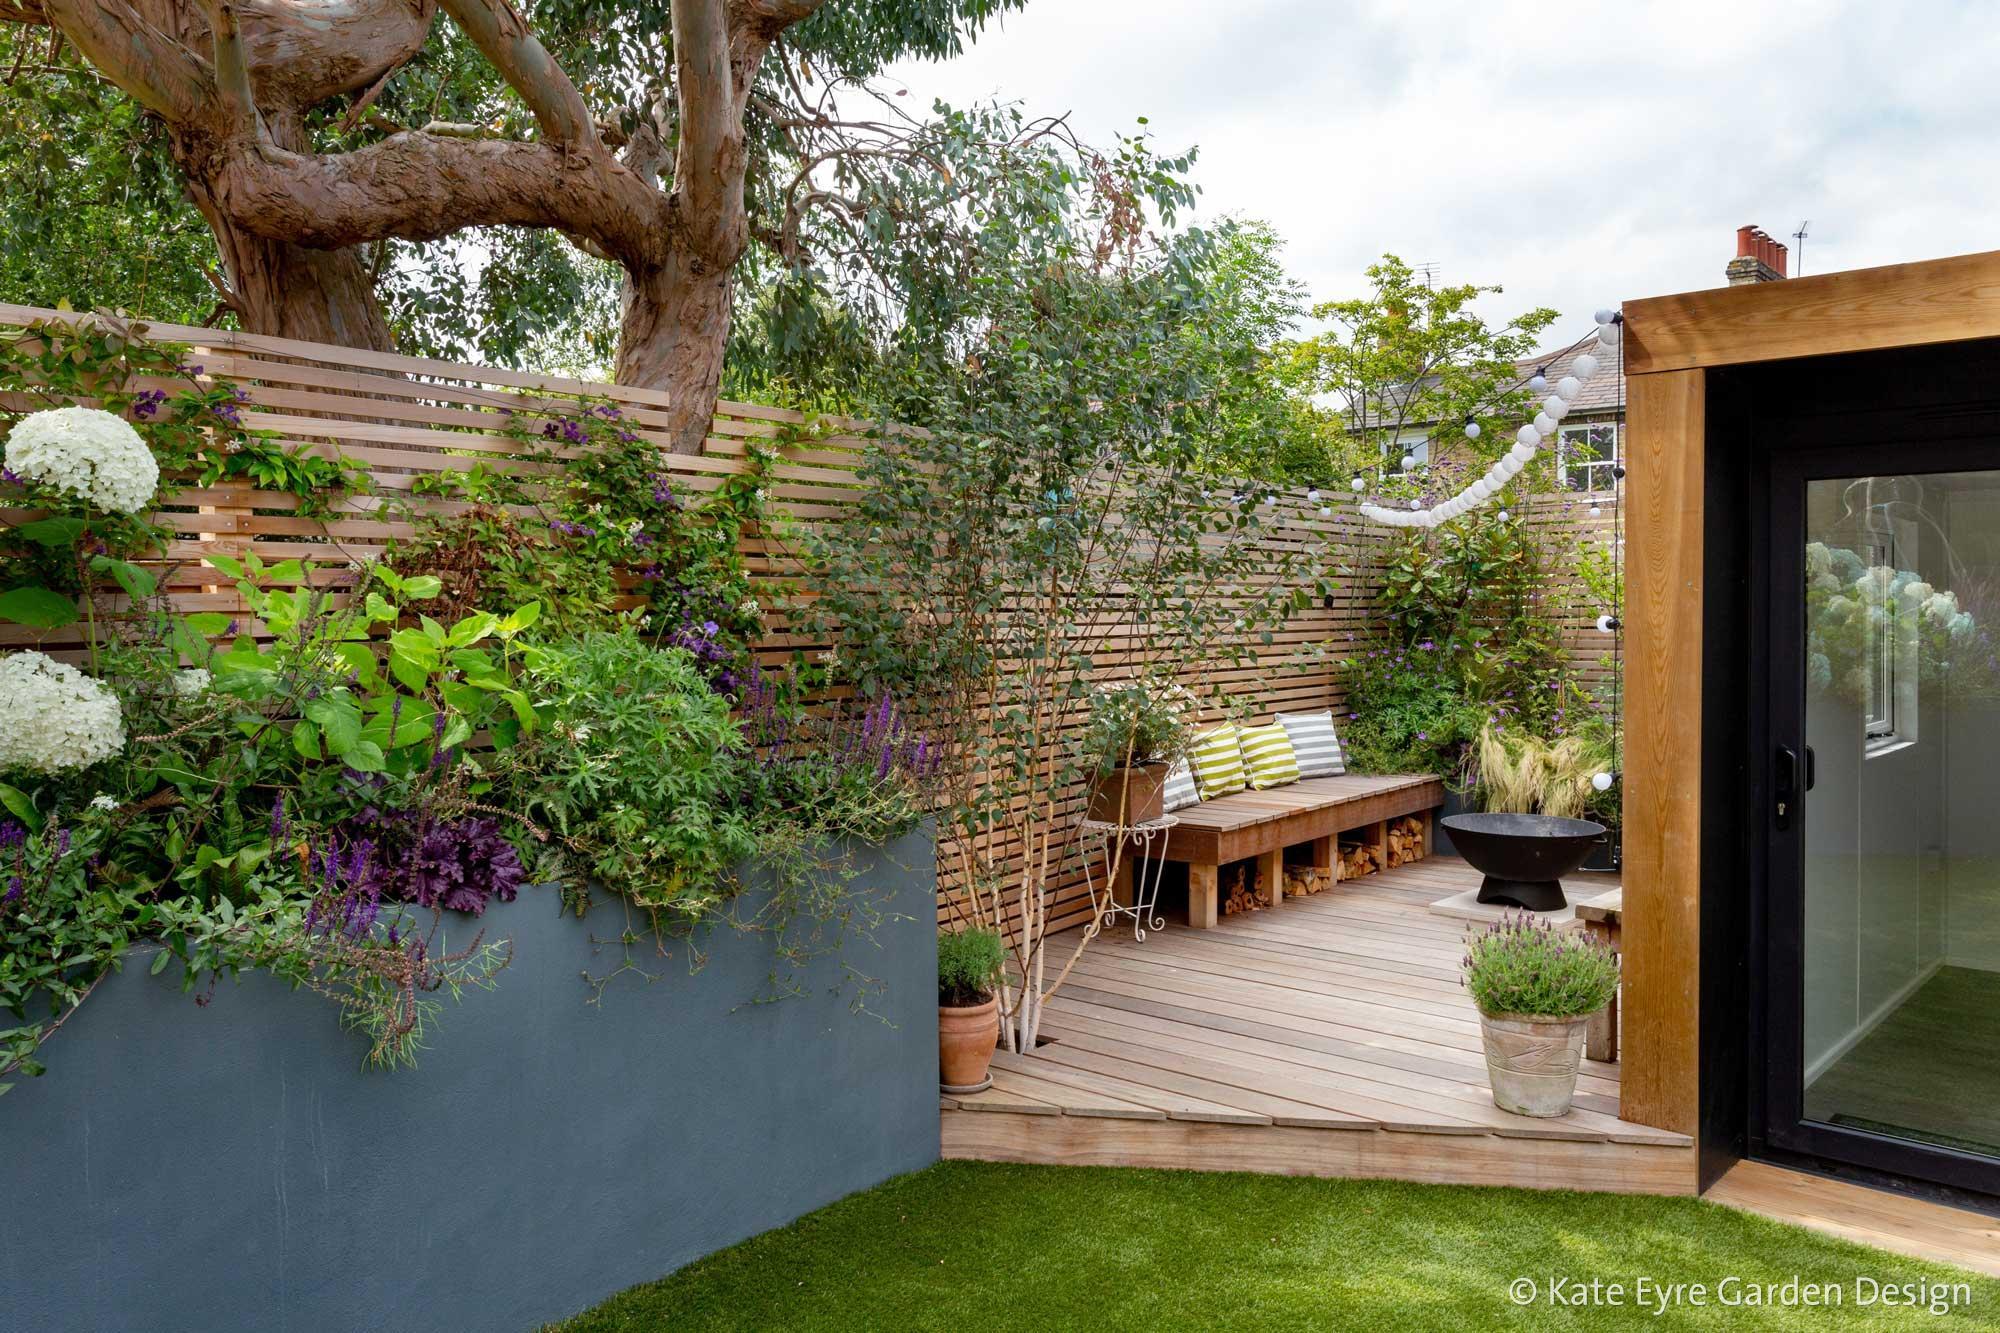 Ildersly Grove 3: raised planter & deck